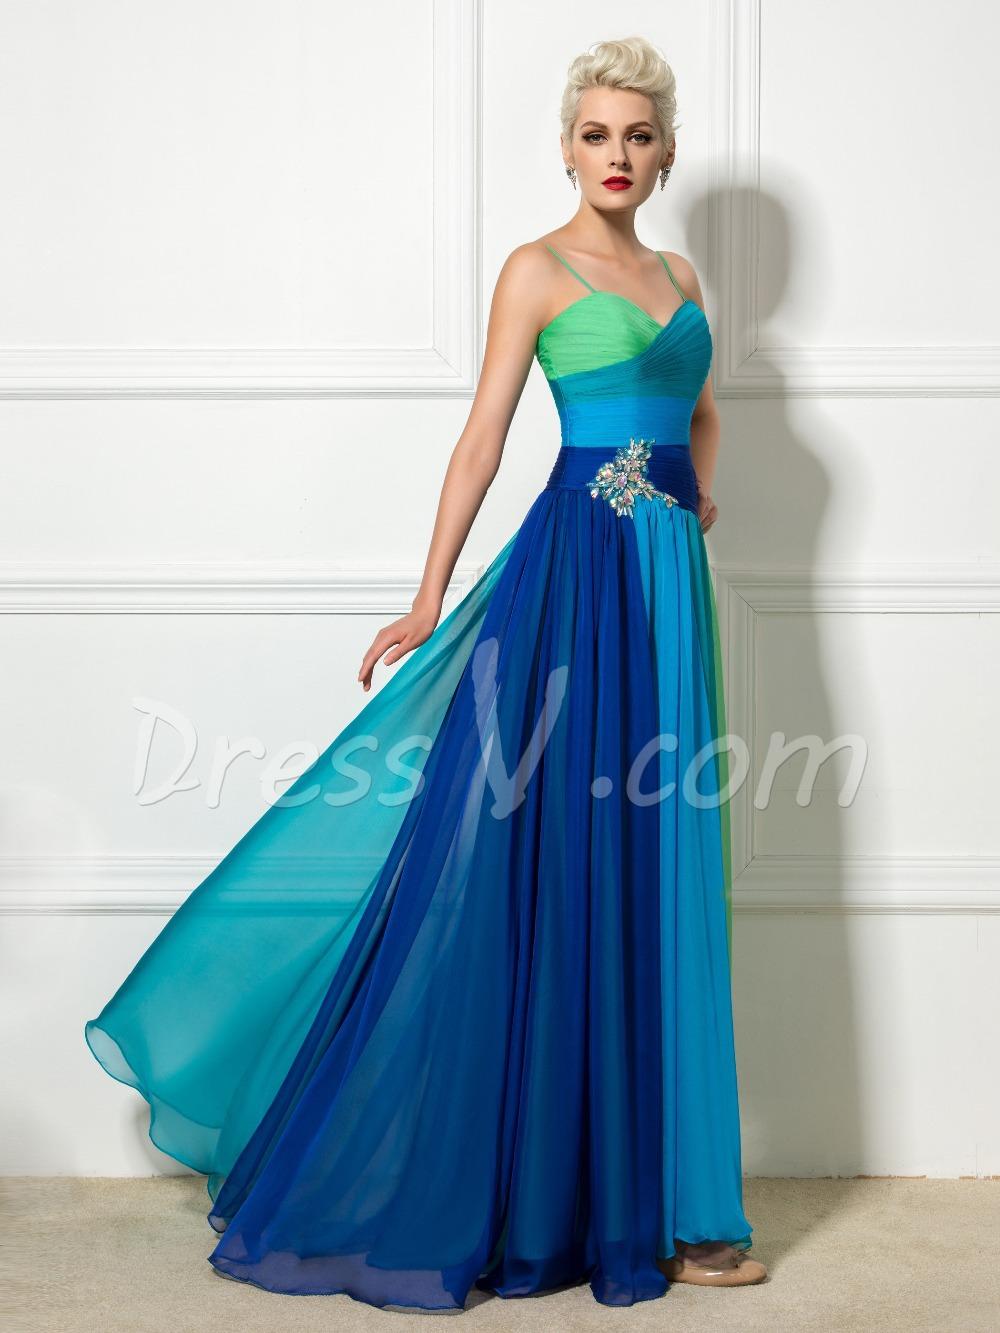 Summer Evening Dresses 2015 | Dress images